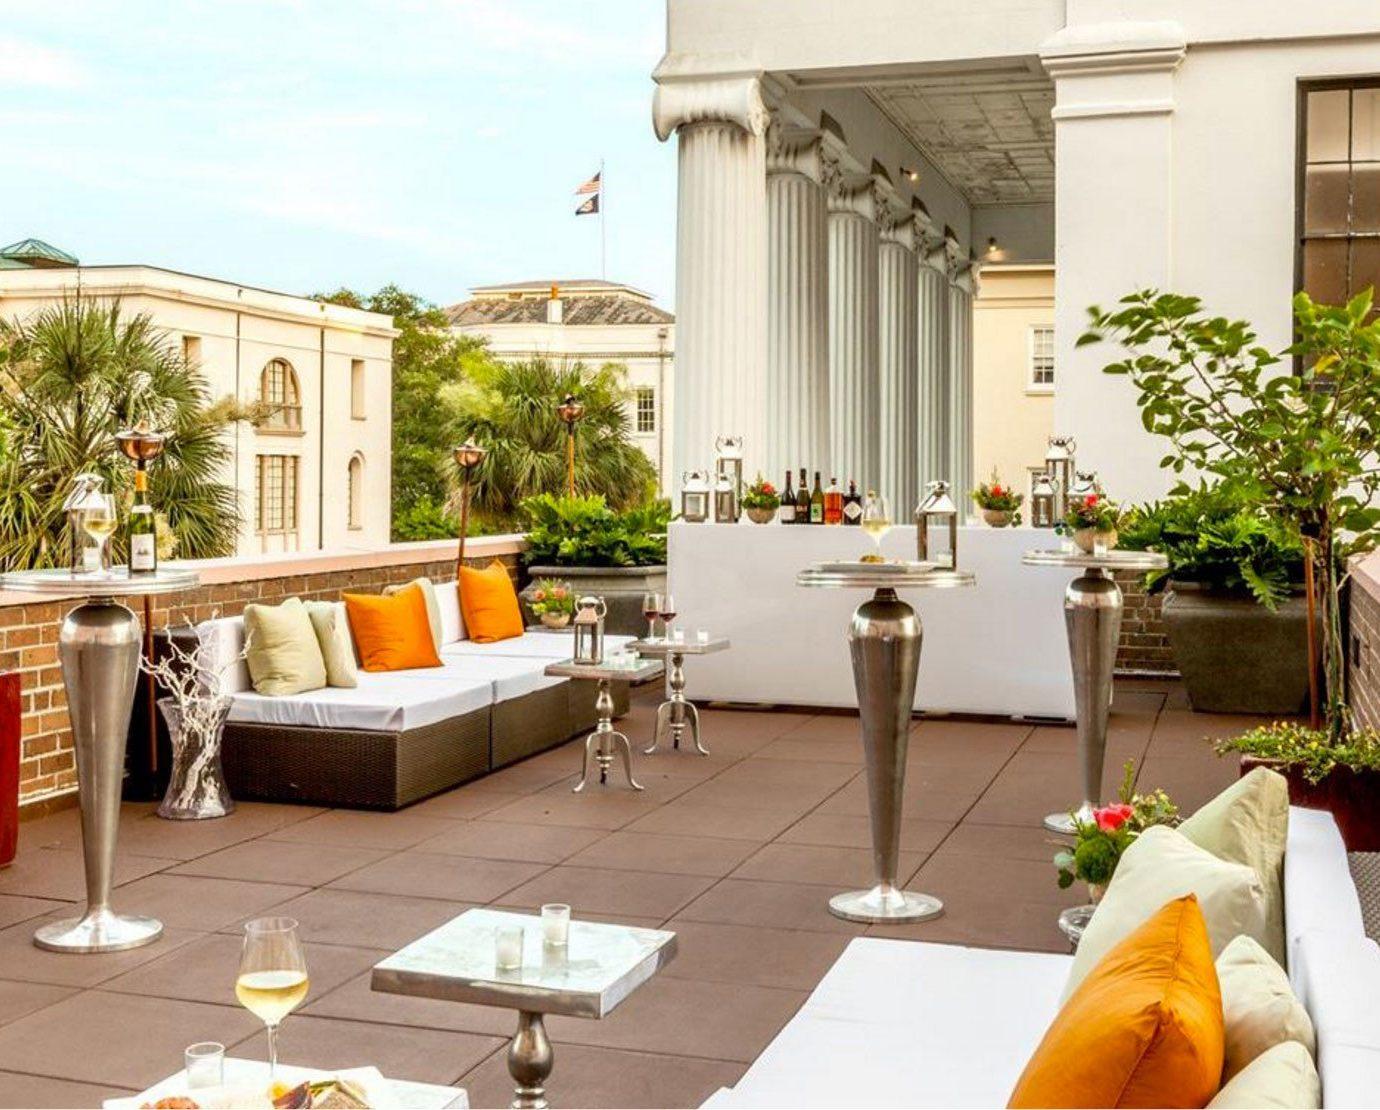 property Courtyard Villa home restaurant backyard condominium hacienda outdoor structure cottage porch Balcony